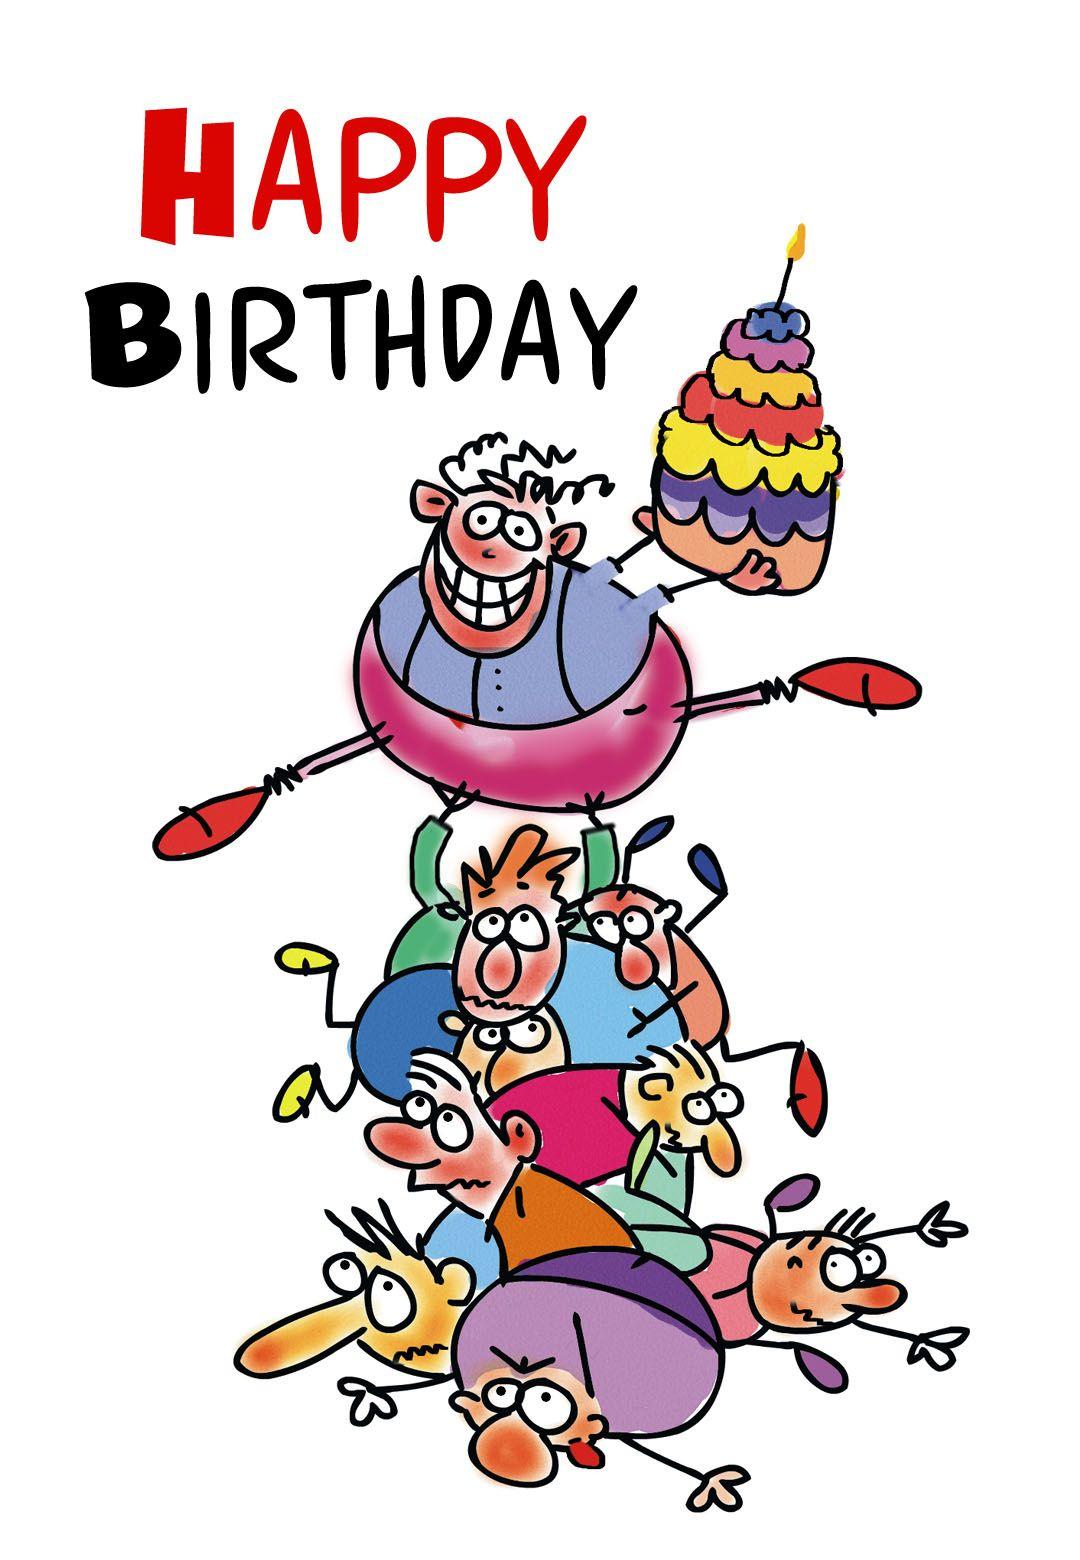 Free Printable Funny Birthday Greeting Card | Gifts To Make | Free - Free Printable Birthday Cards To Color